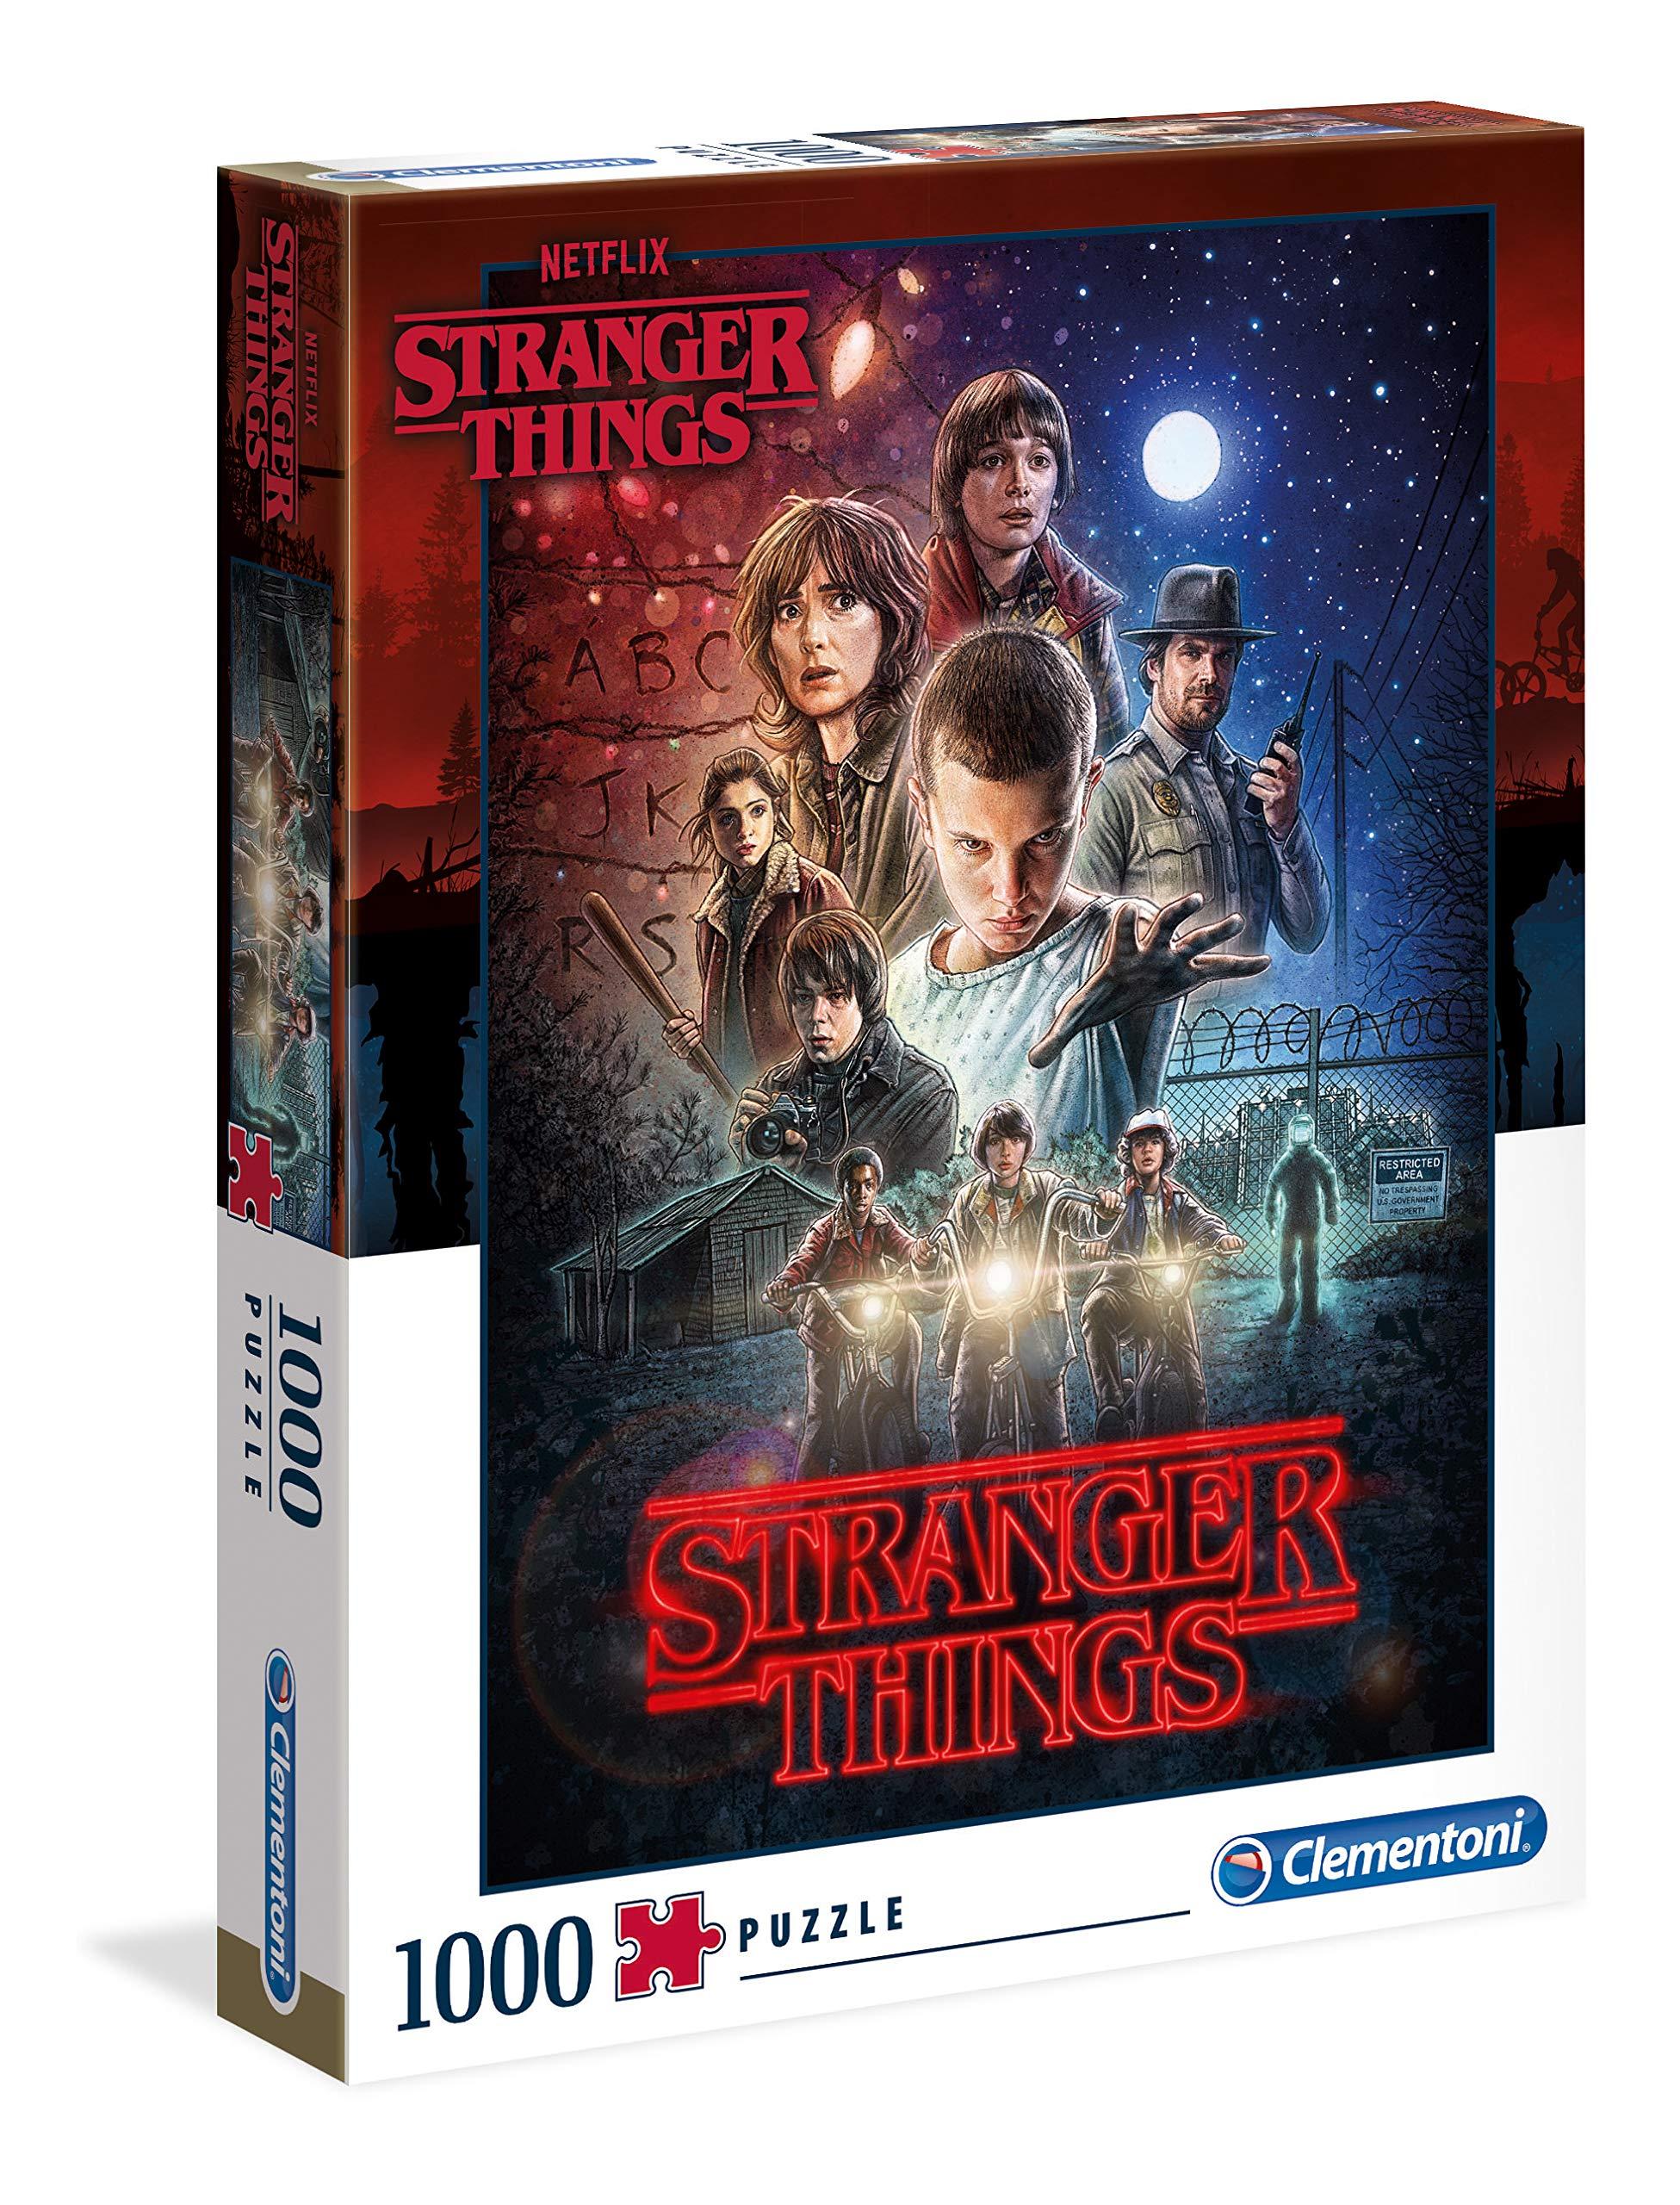 Clementoni 39542 Stranger Things Things-1000pc Puzzle 1